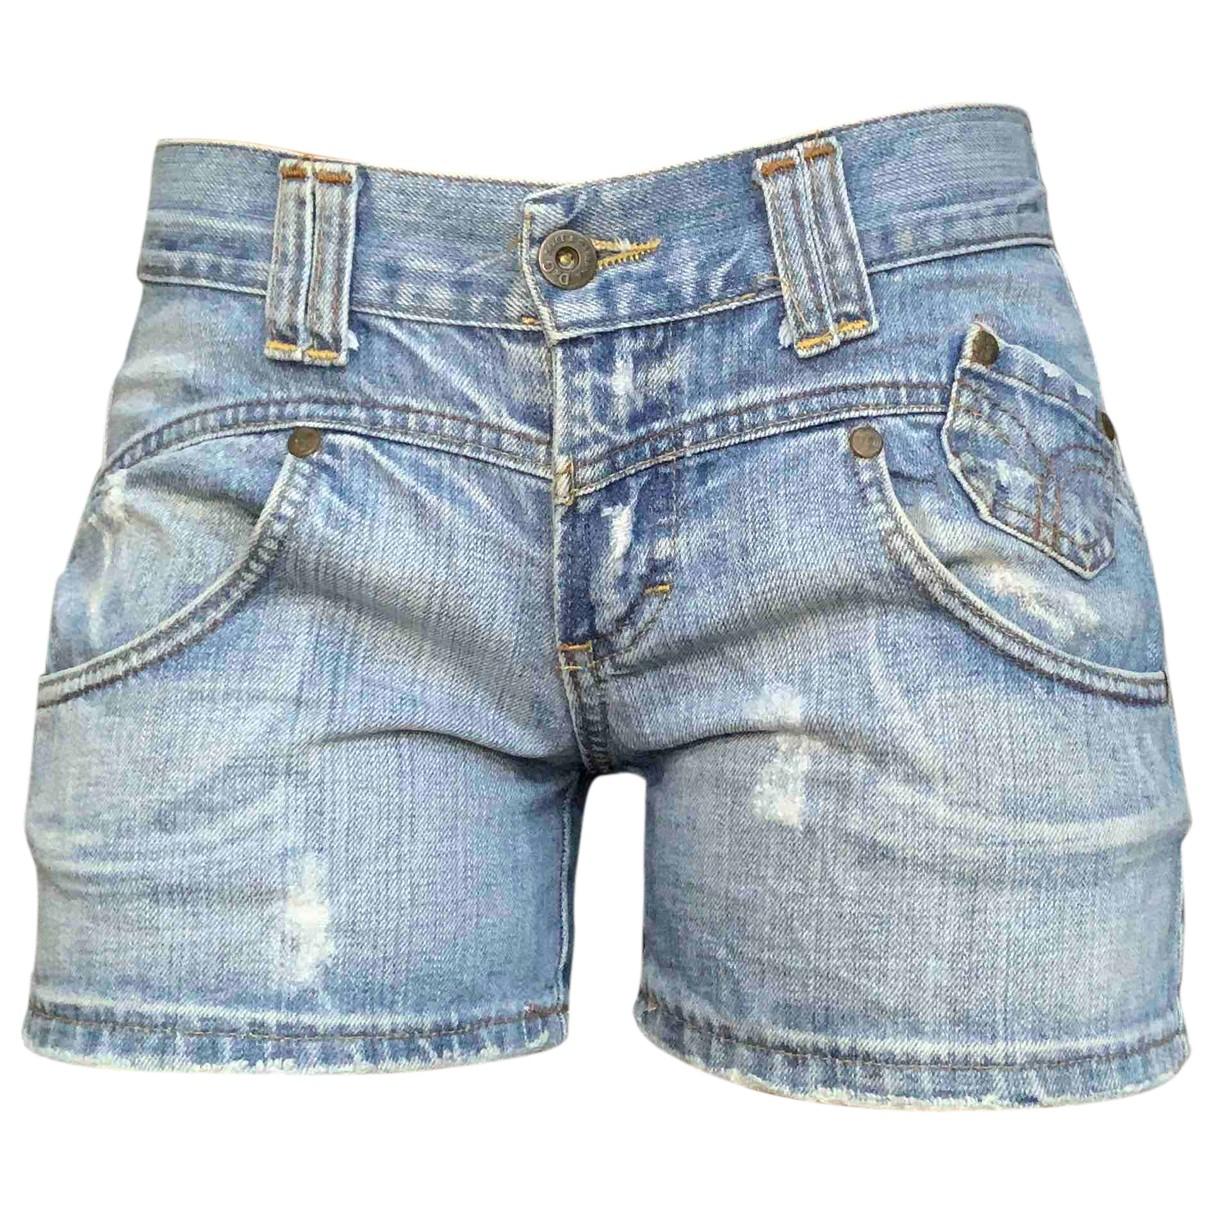 Dolce & Gabbana N Blue Denim - Jeans Shorts for Women 42 IT